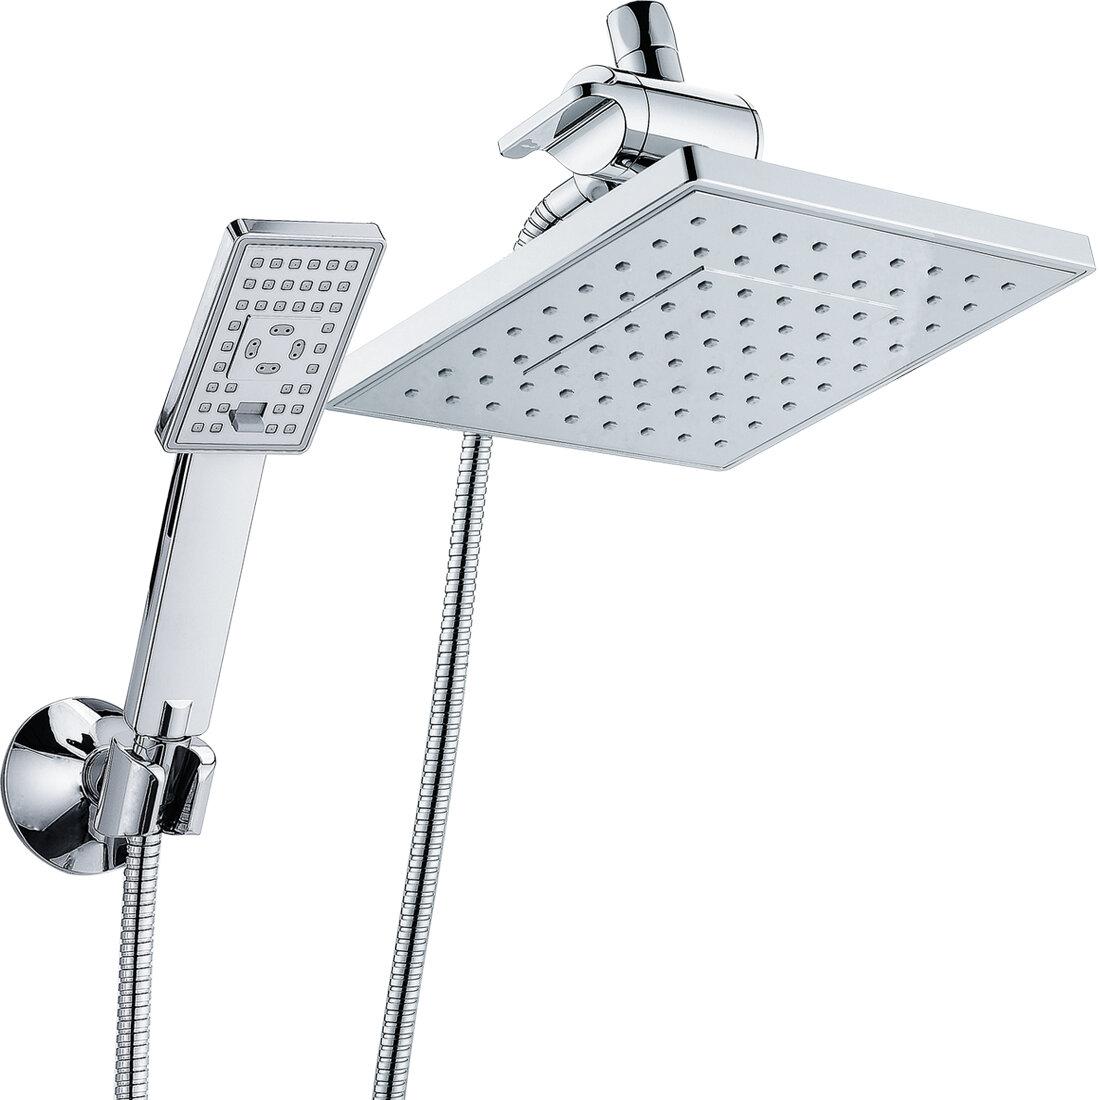 Shower Head Hand Shower Shower Head Chrome Shower Head Rain Shower Water Saving